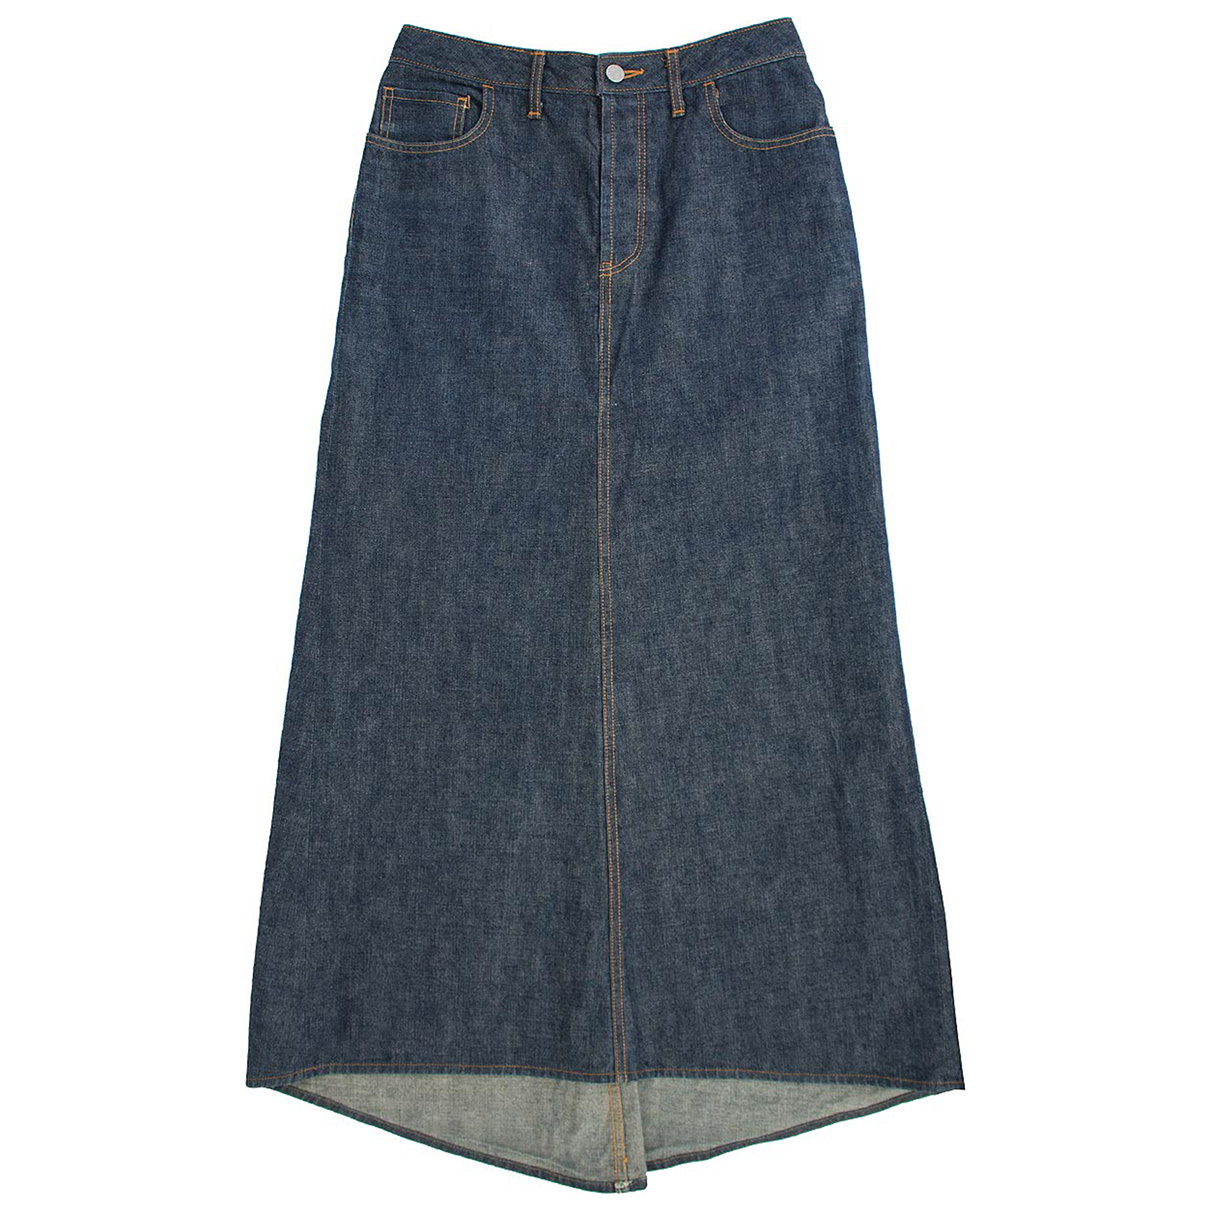 Dries Van Noten - Jupe   pour femme en denim - bleu